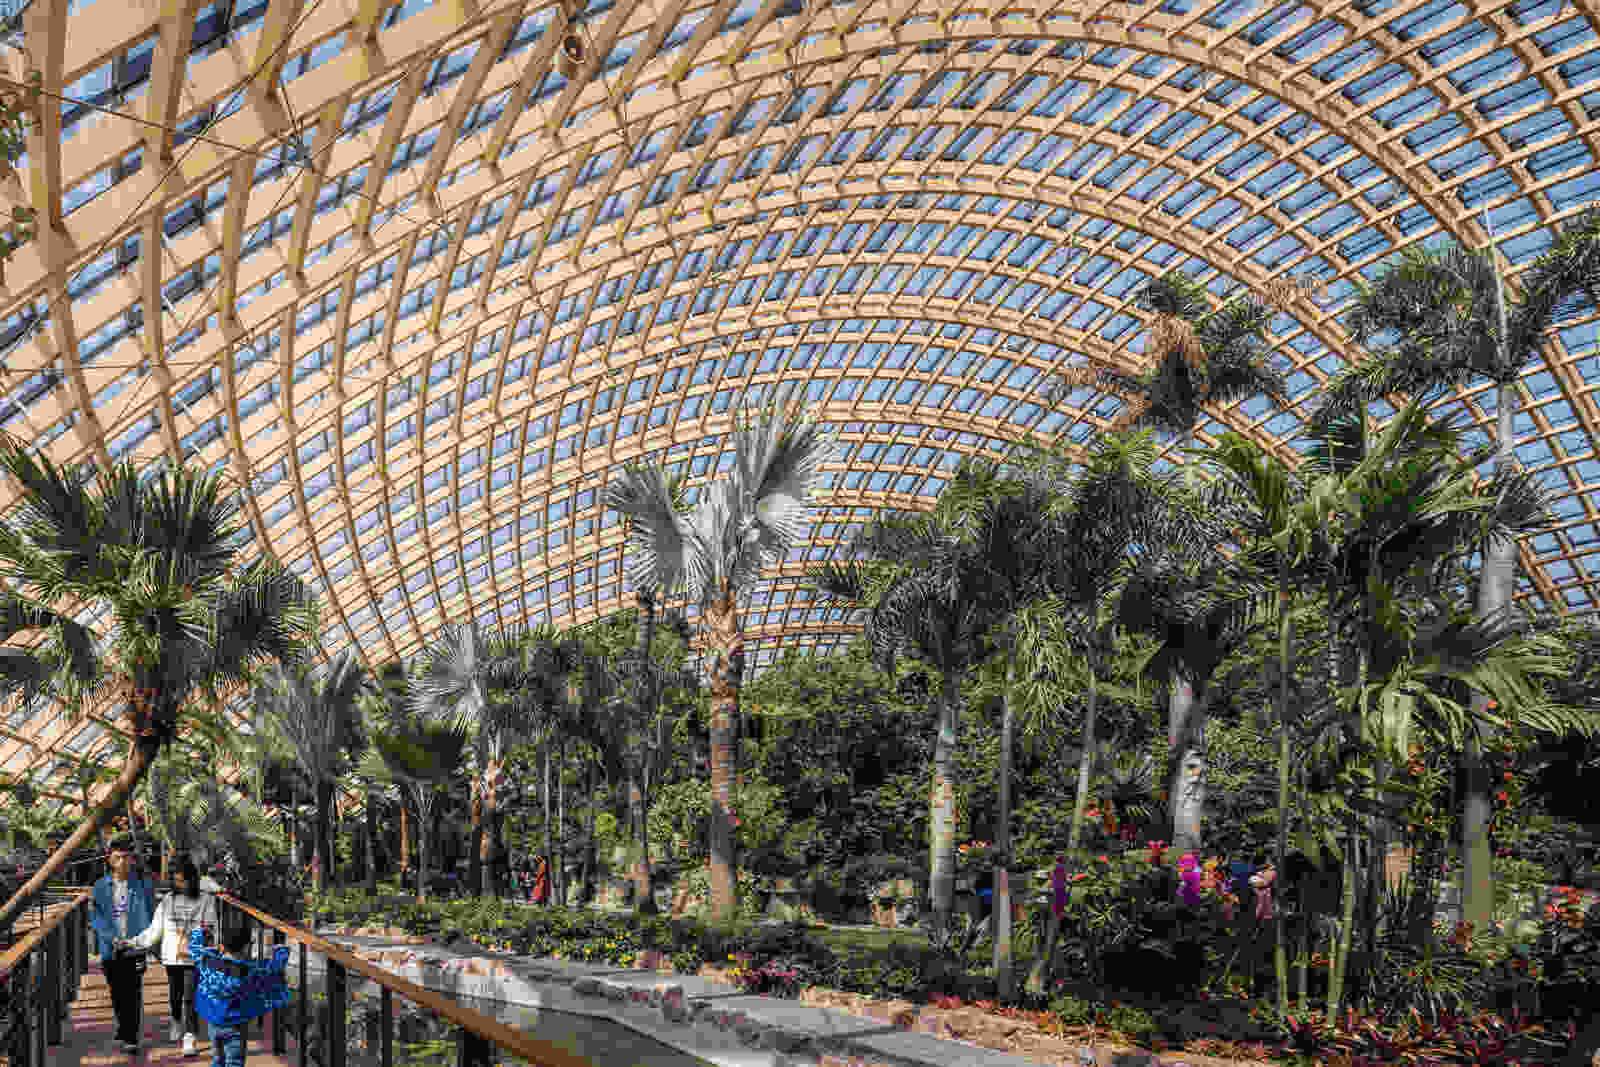 338 dmaa Taiyuan Botanical Garden 02 greenhouse 5668 Creat AR